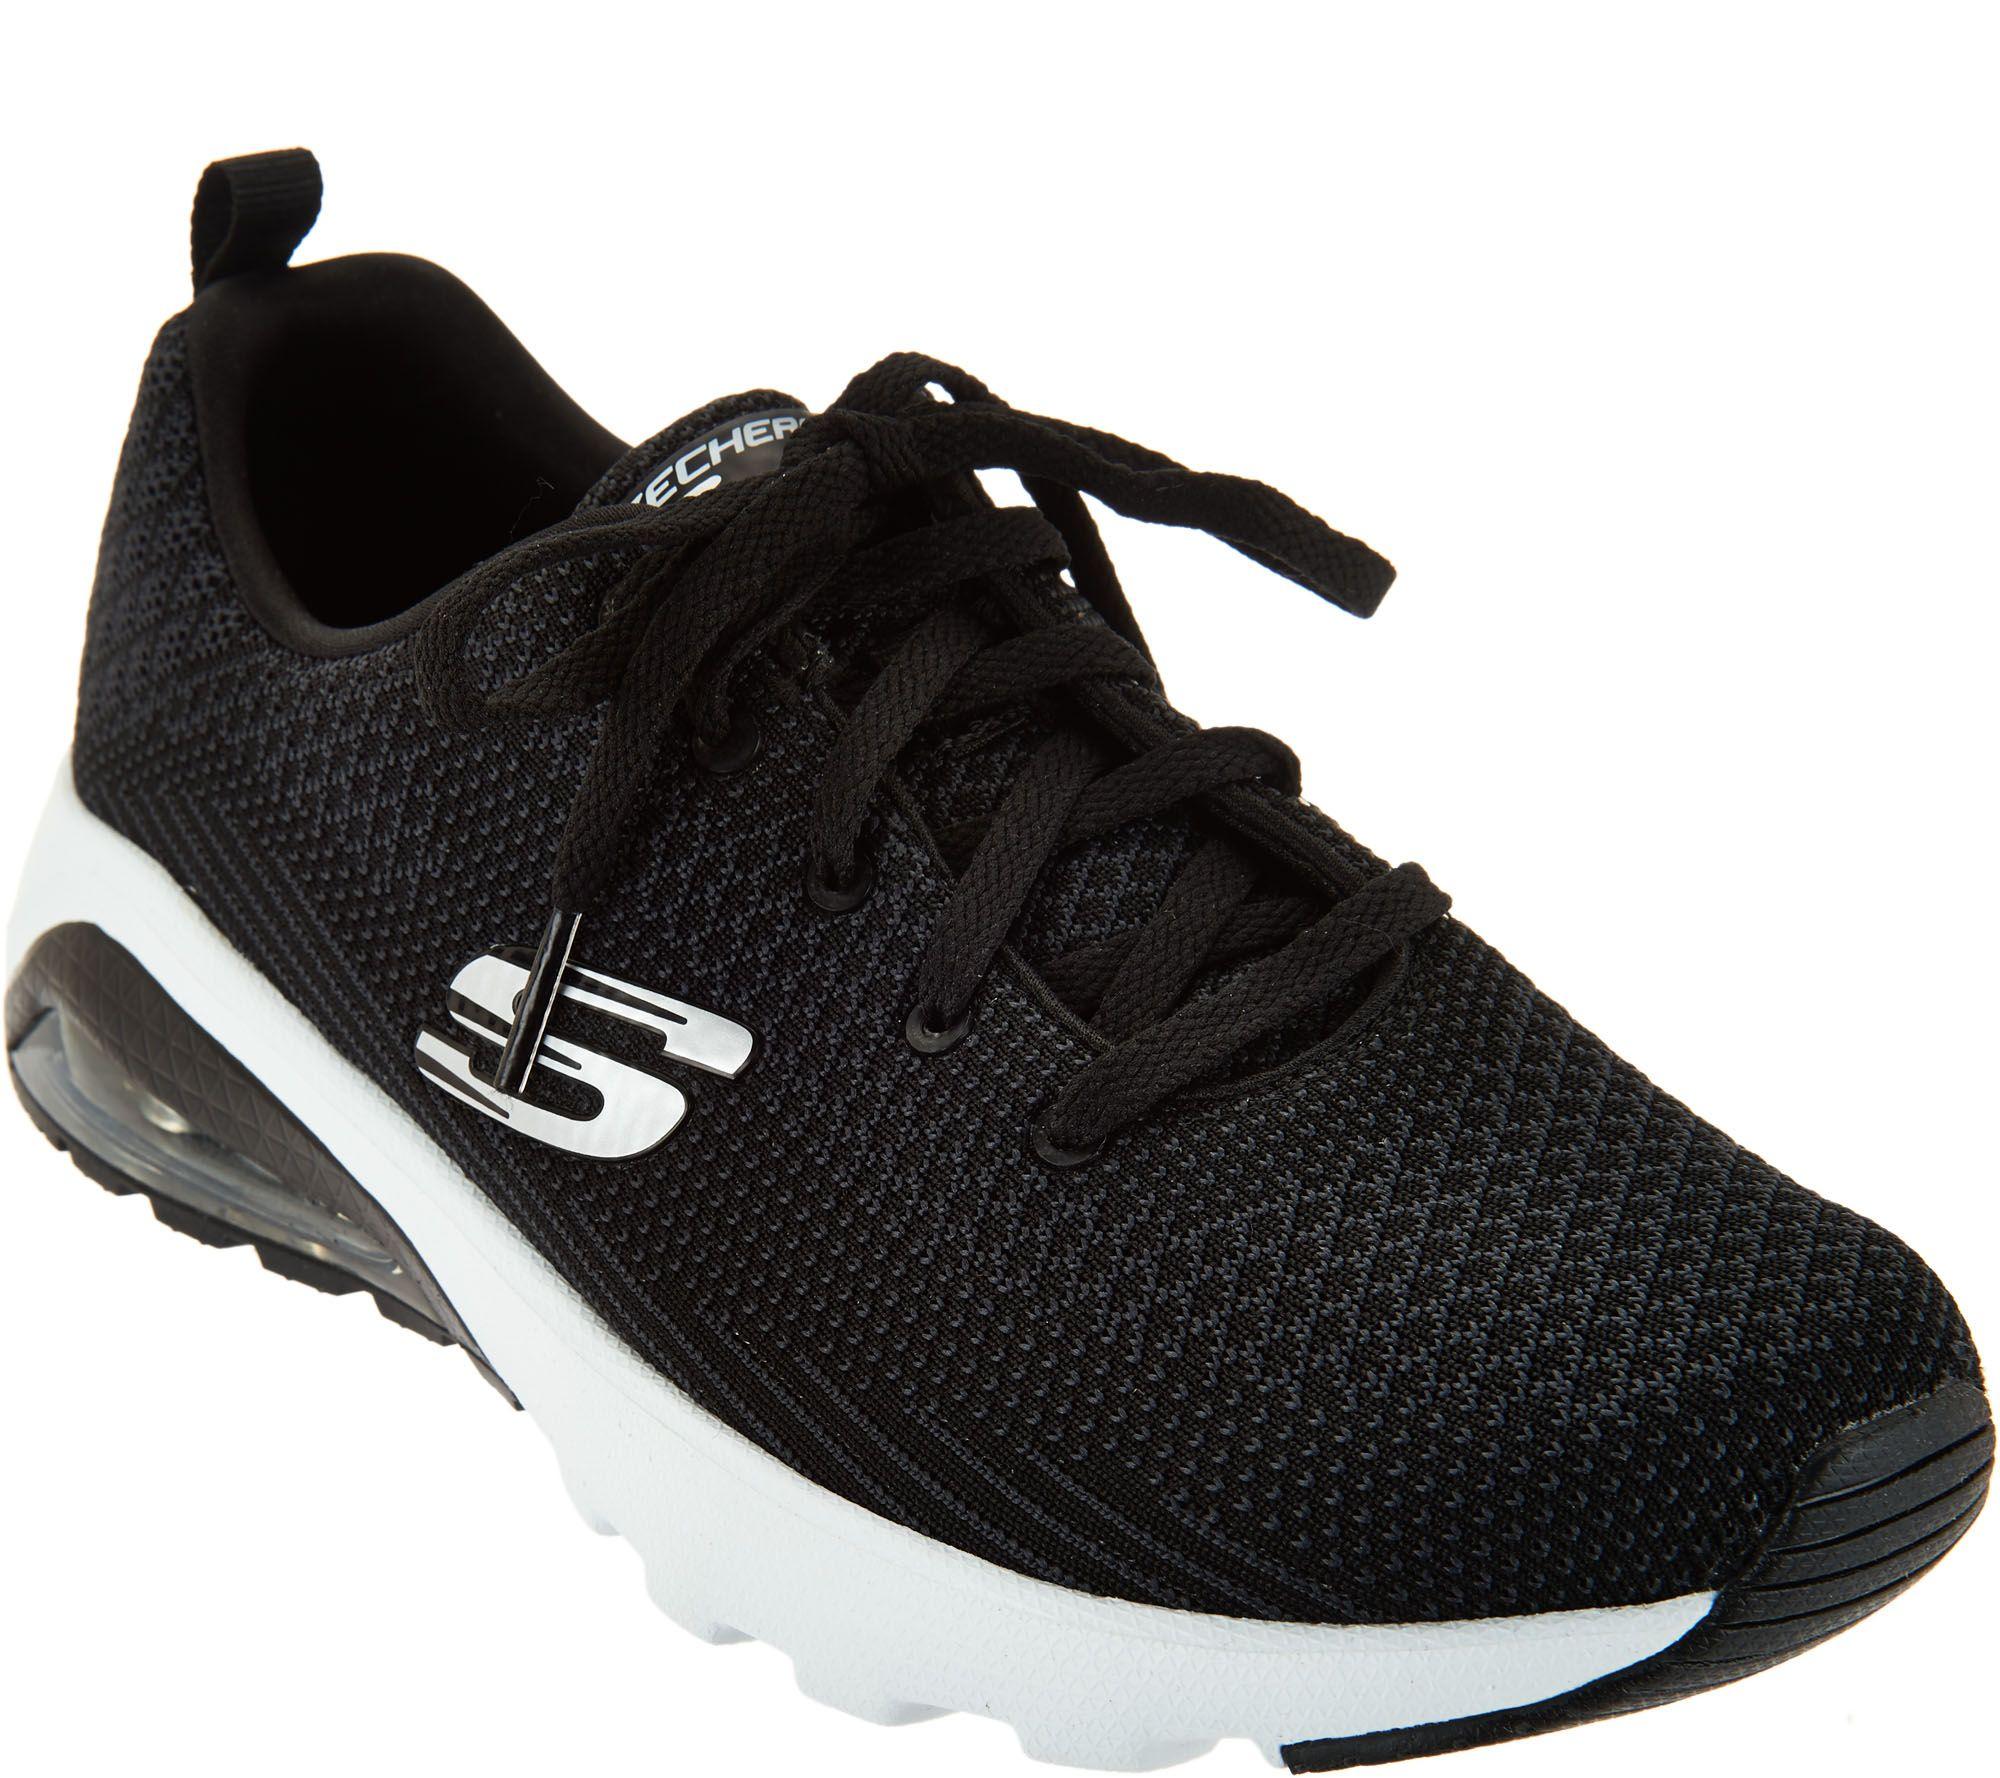 Skechers Sport Skech-Air Lace-up Sneakers